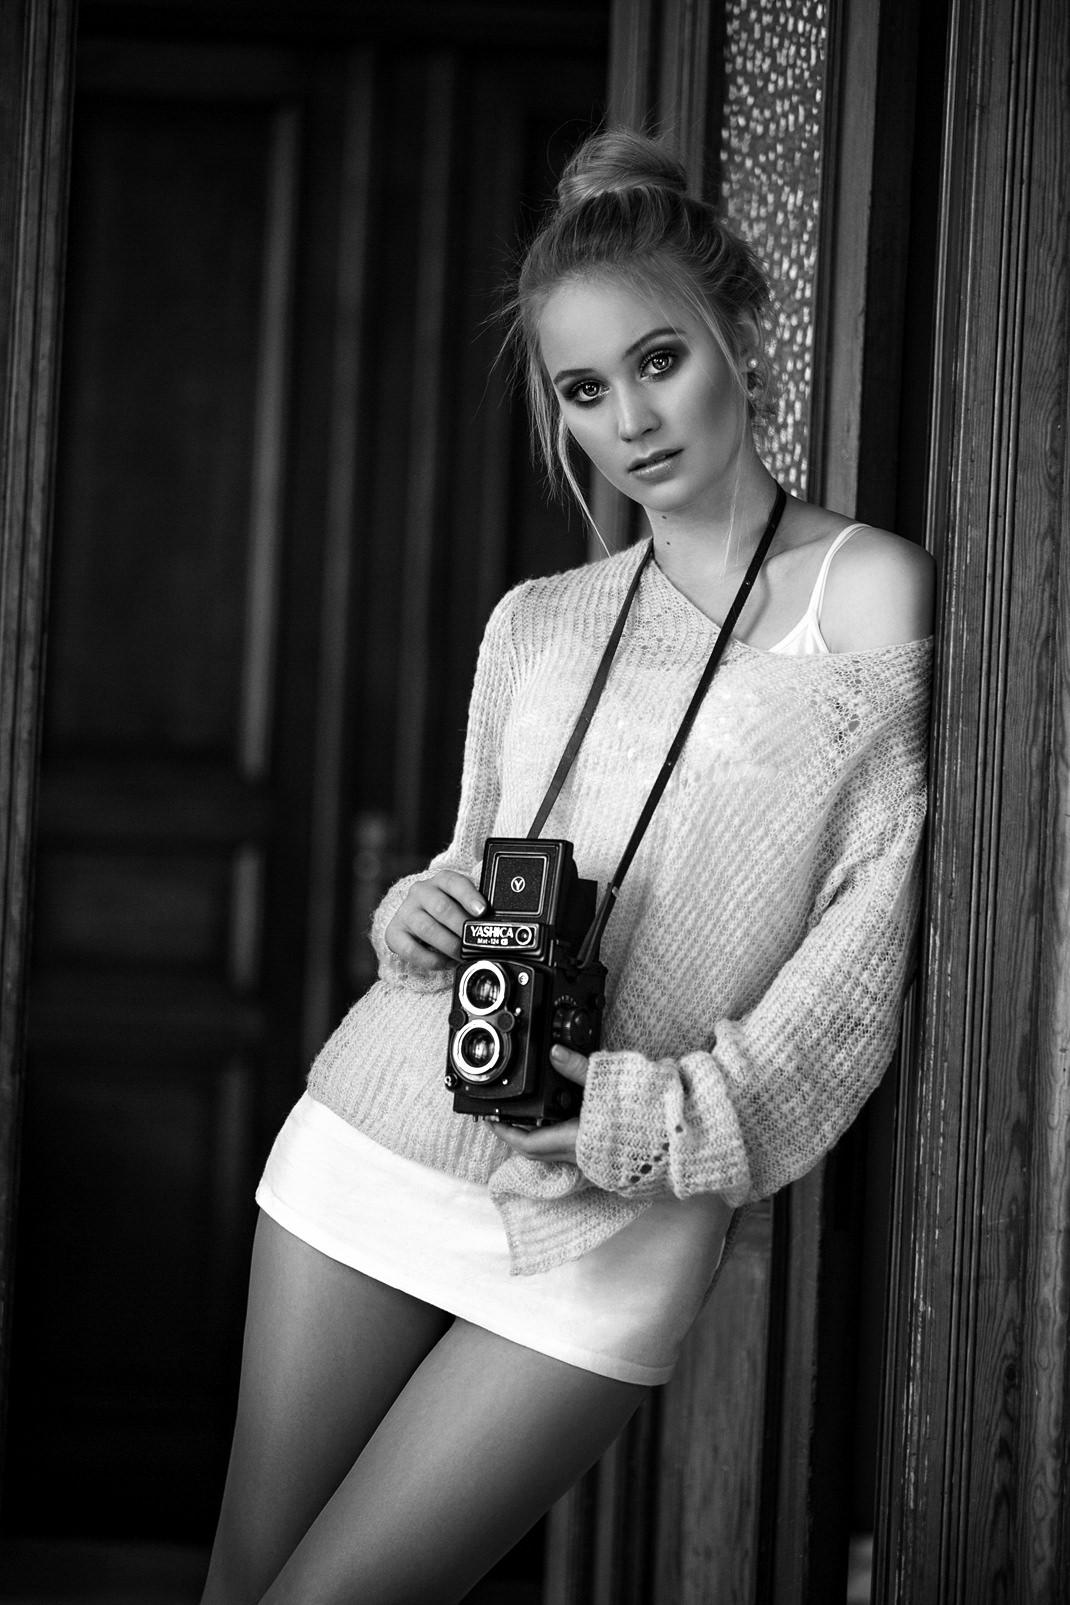 Two Beauties - Antonia & Yashica MAT 124 G - Markus Hertzsch - Camera - Girl